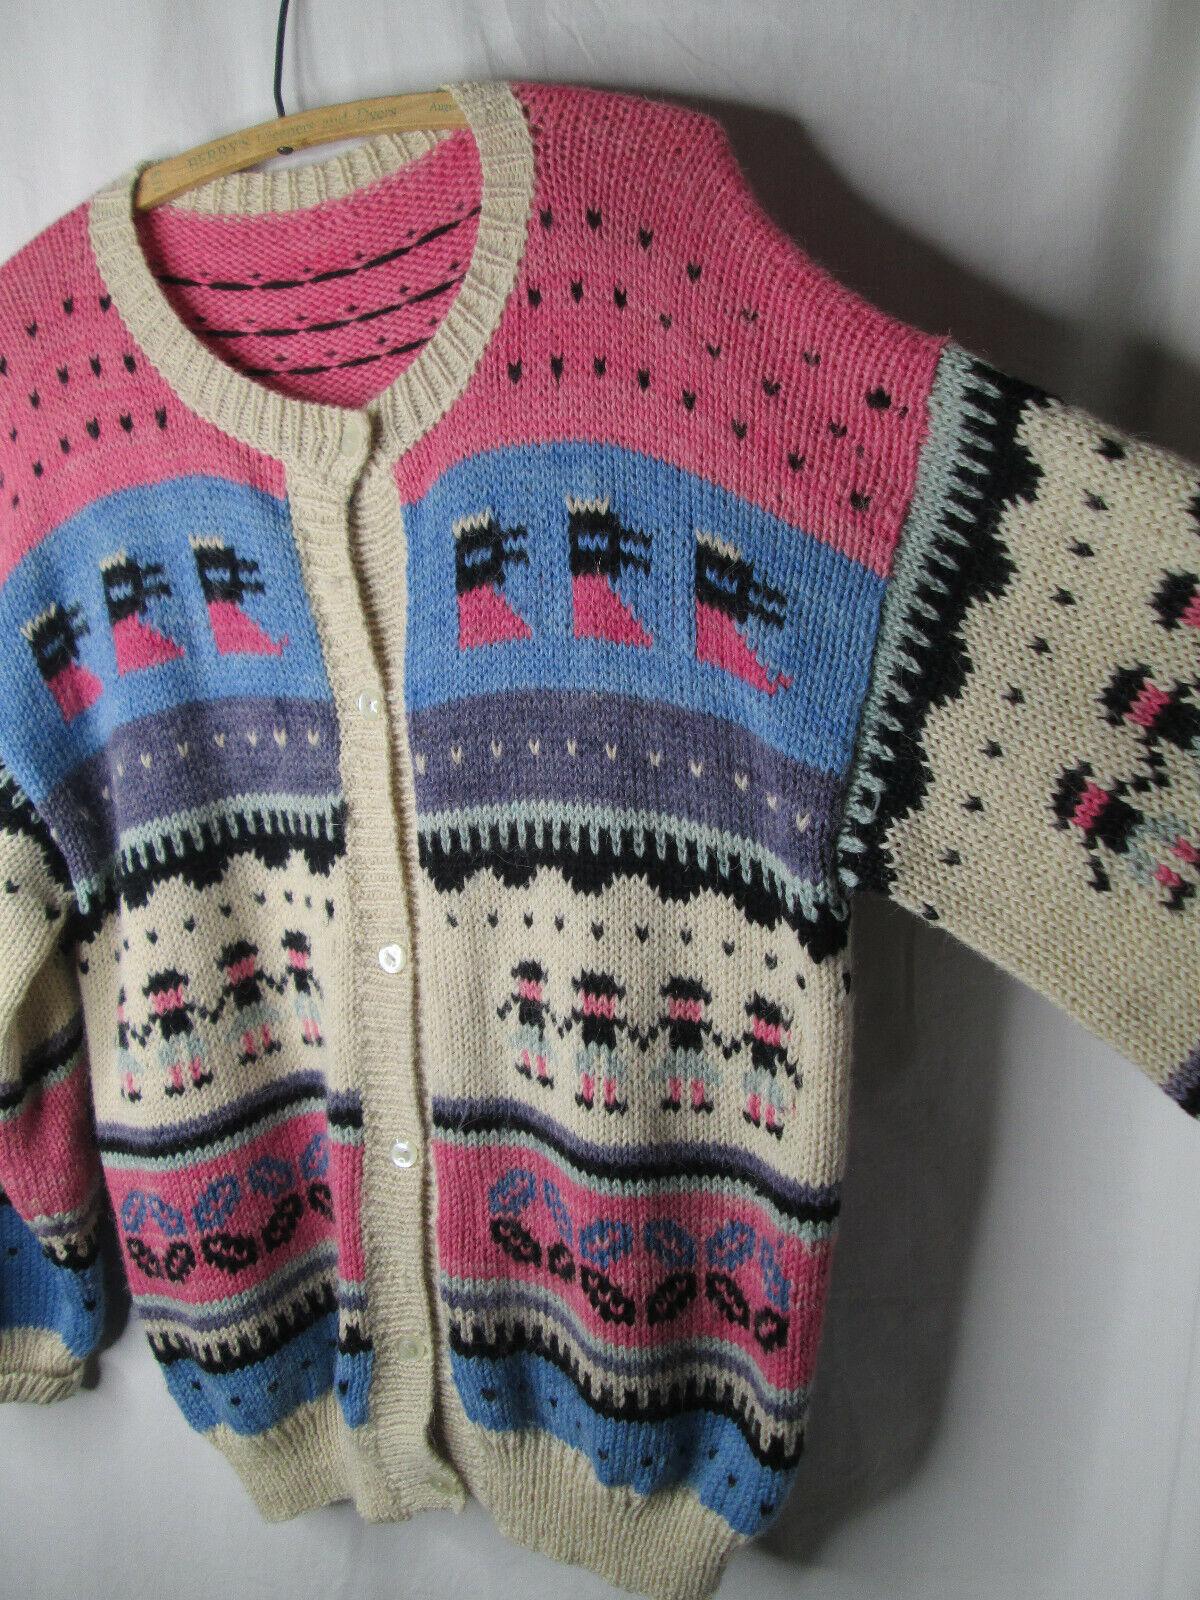 hand knit sweater  Southwestern style wool sweater  colorful wool cardigan vintage hand knit wool cardigan sweater